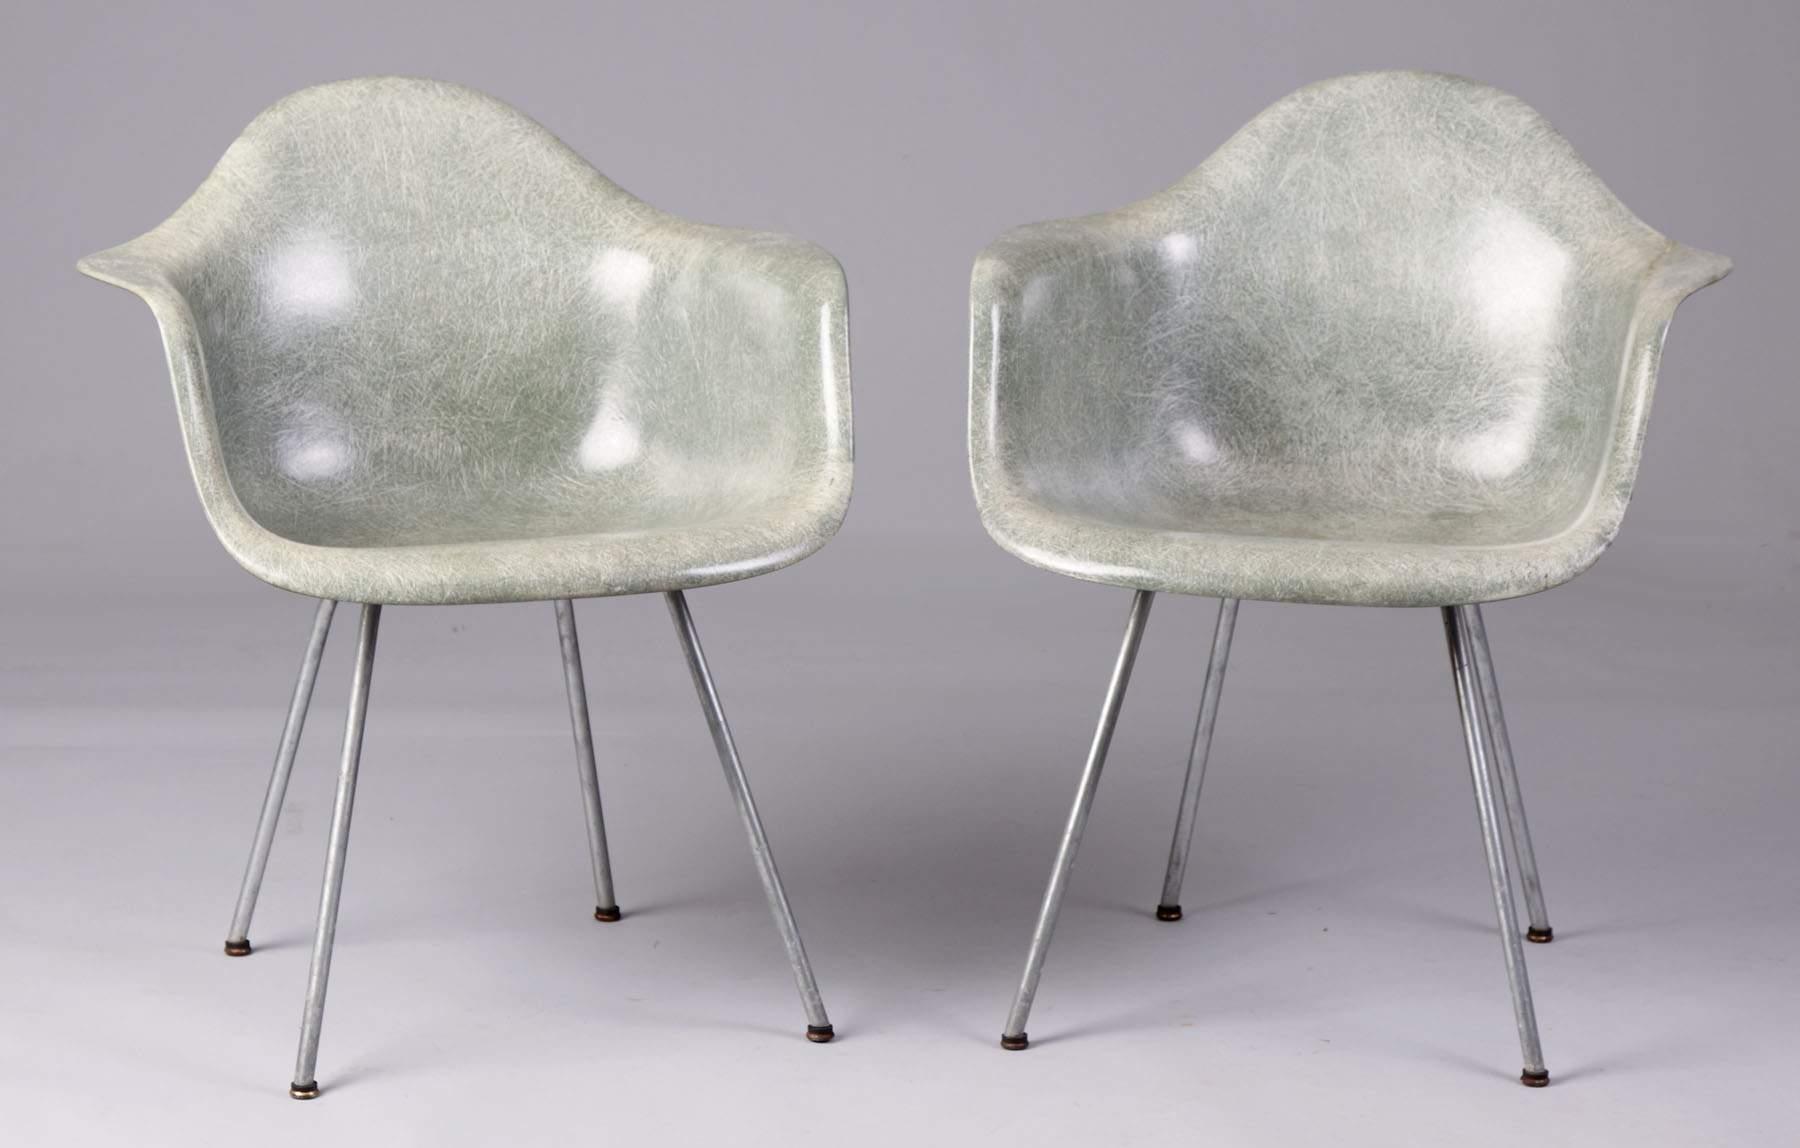 Superieur 2 Fiberglass Eames Chairs